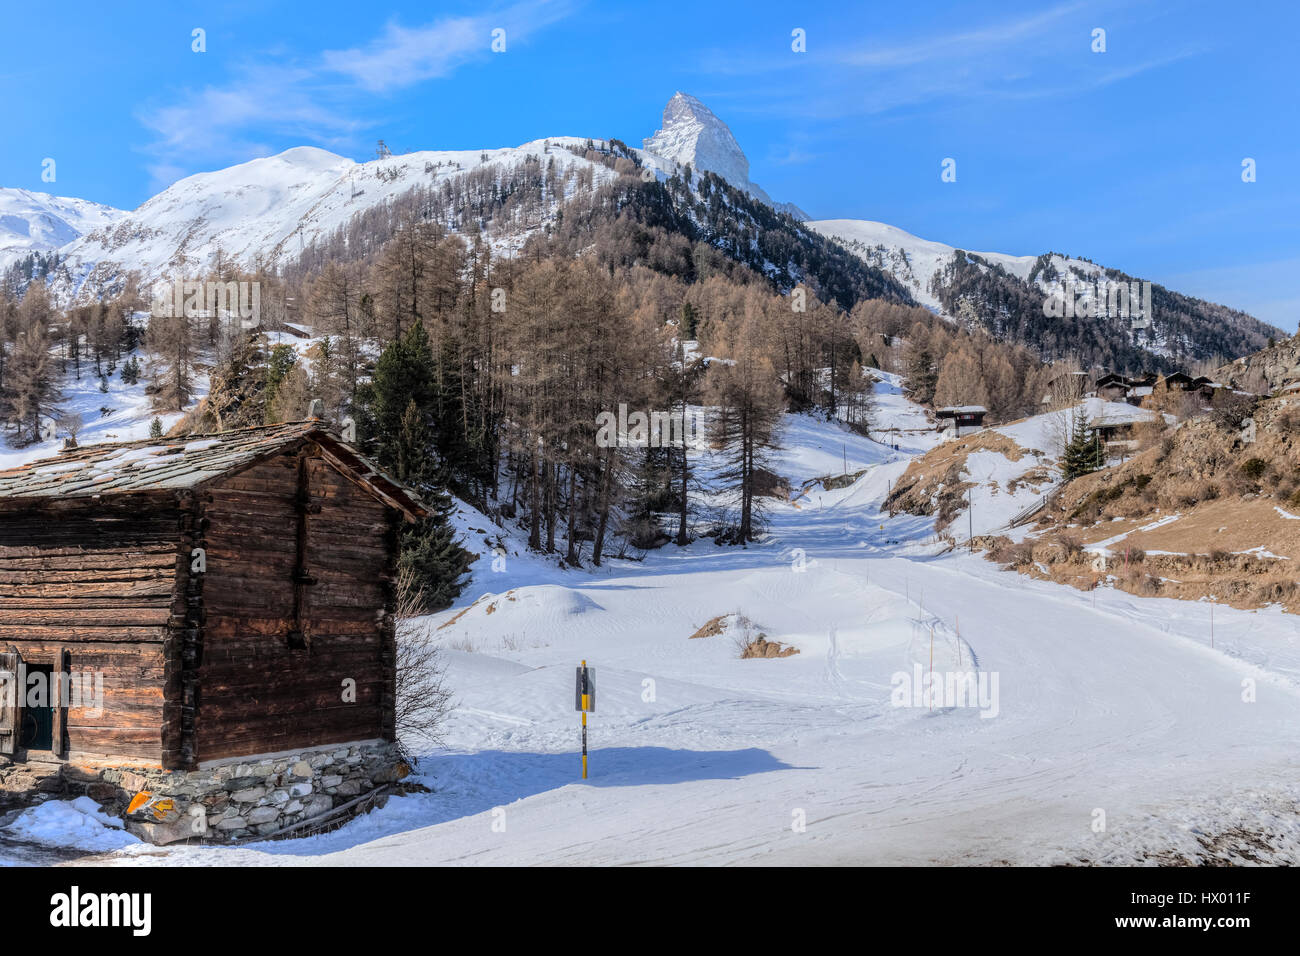 Blatten, Matterhorn, Zermatt, Valais, Switzerland, Europe - Stock Image